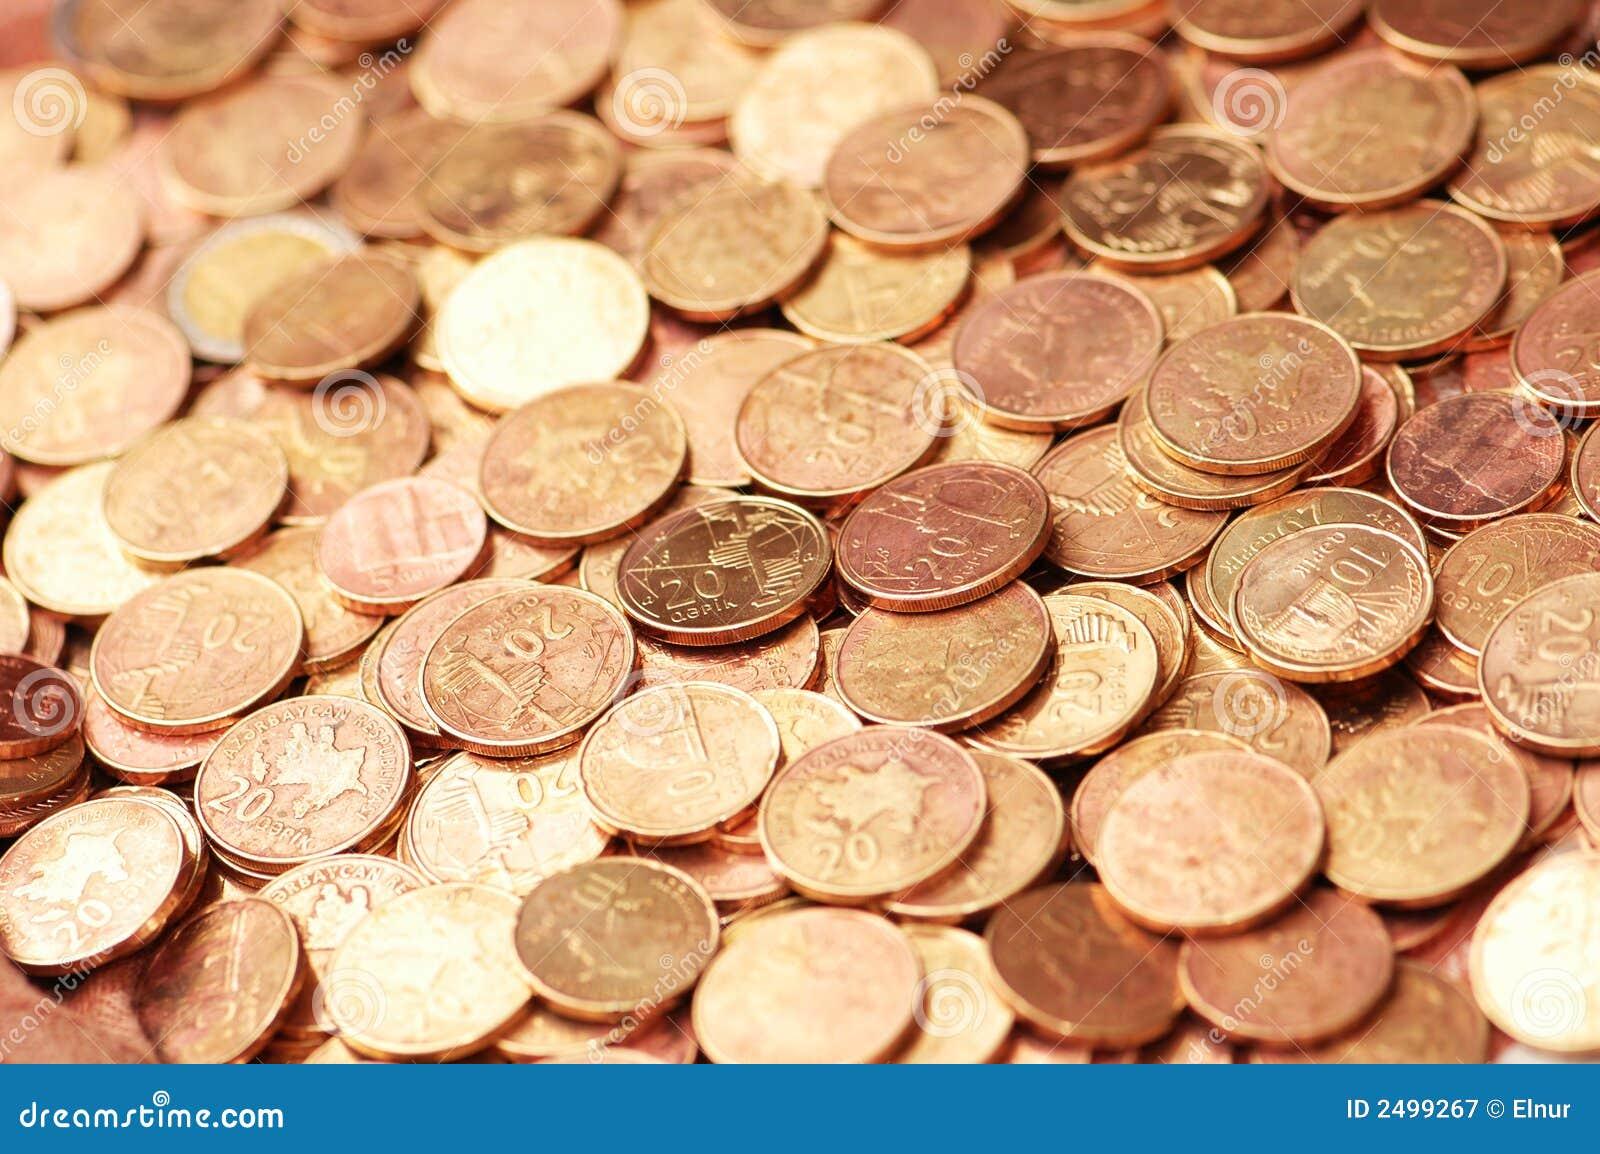 Business concept - Coins